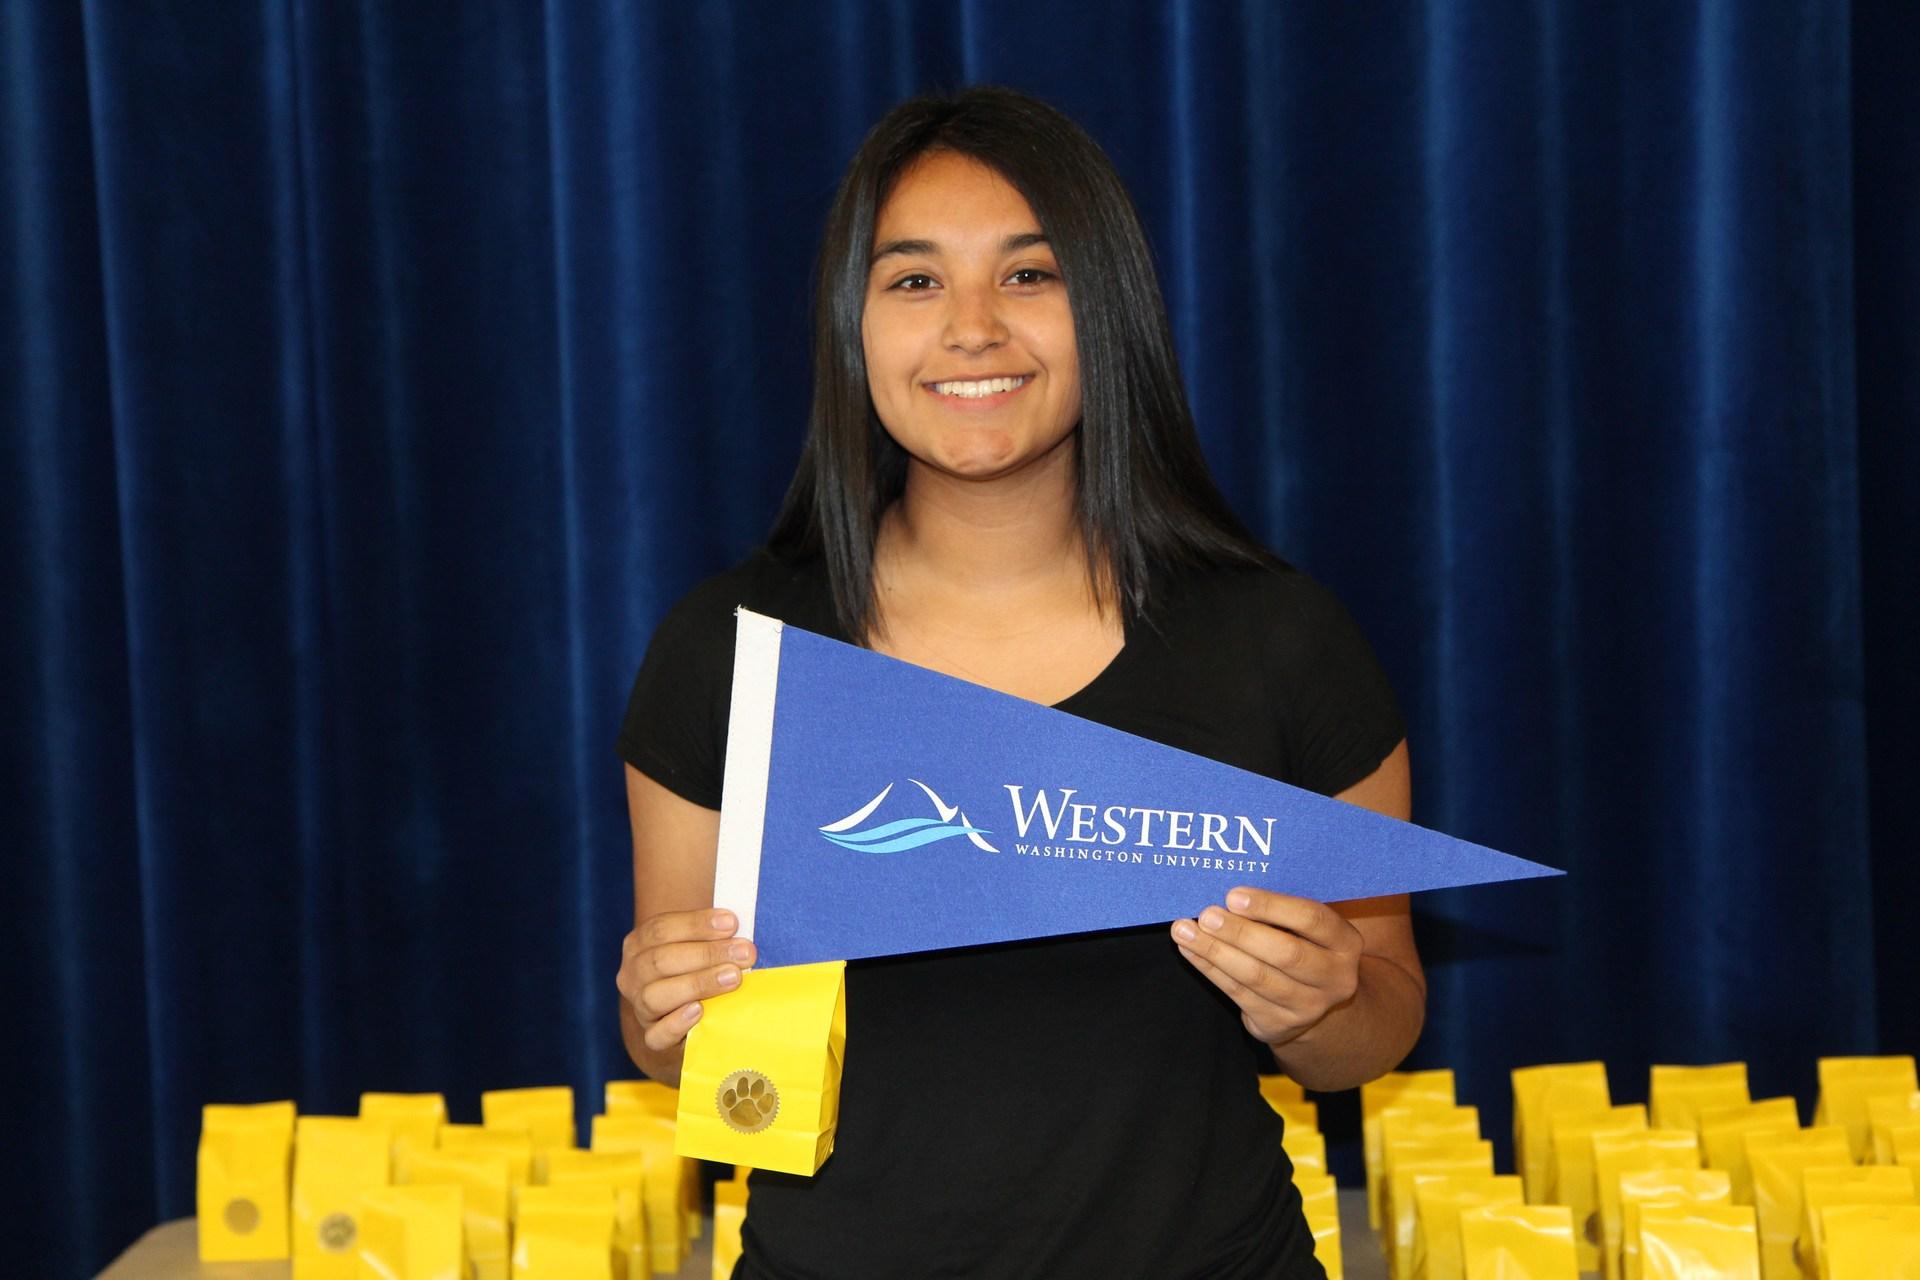 Katy Palma-Wapato High School Class of 2017